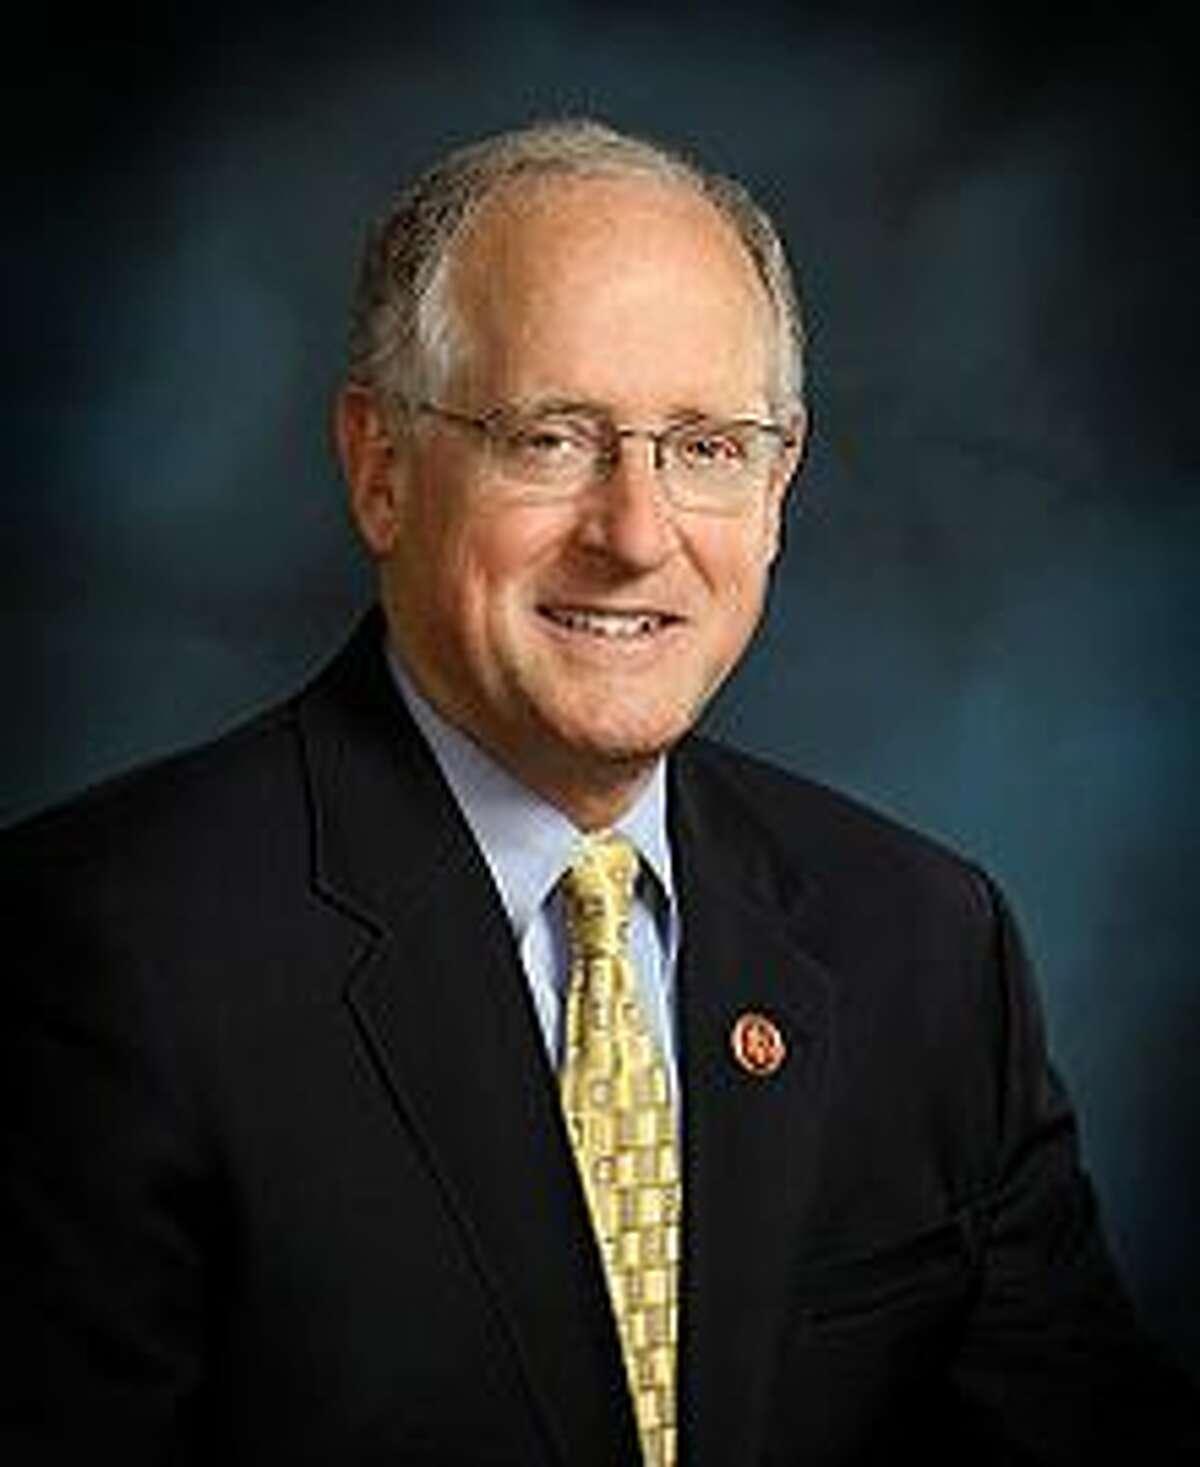 U.S. Rep. Mike Conaway, R- Midland